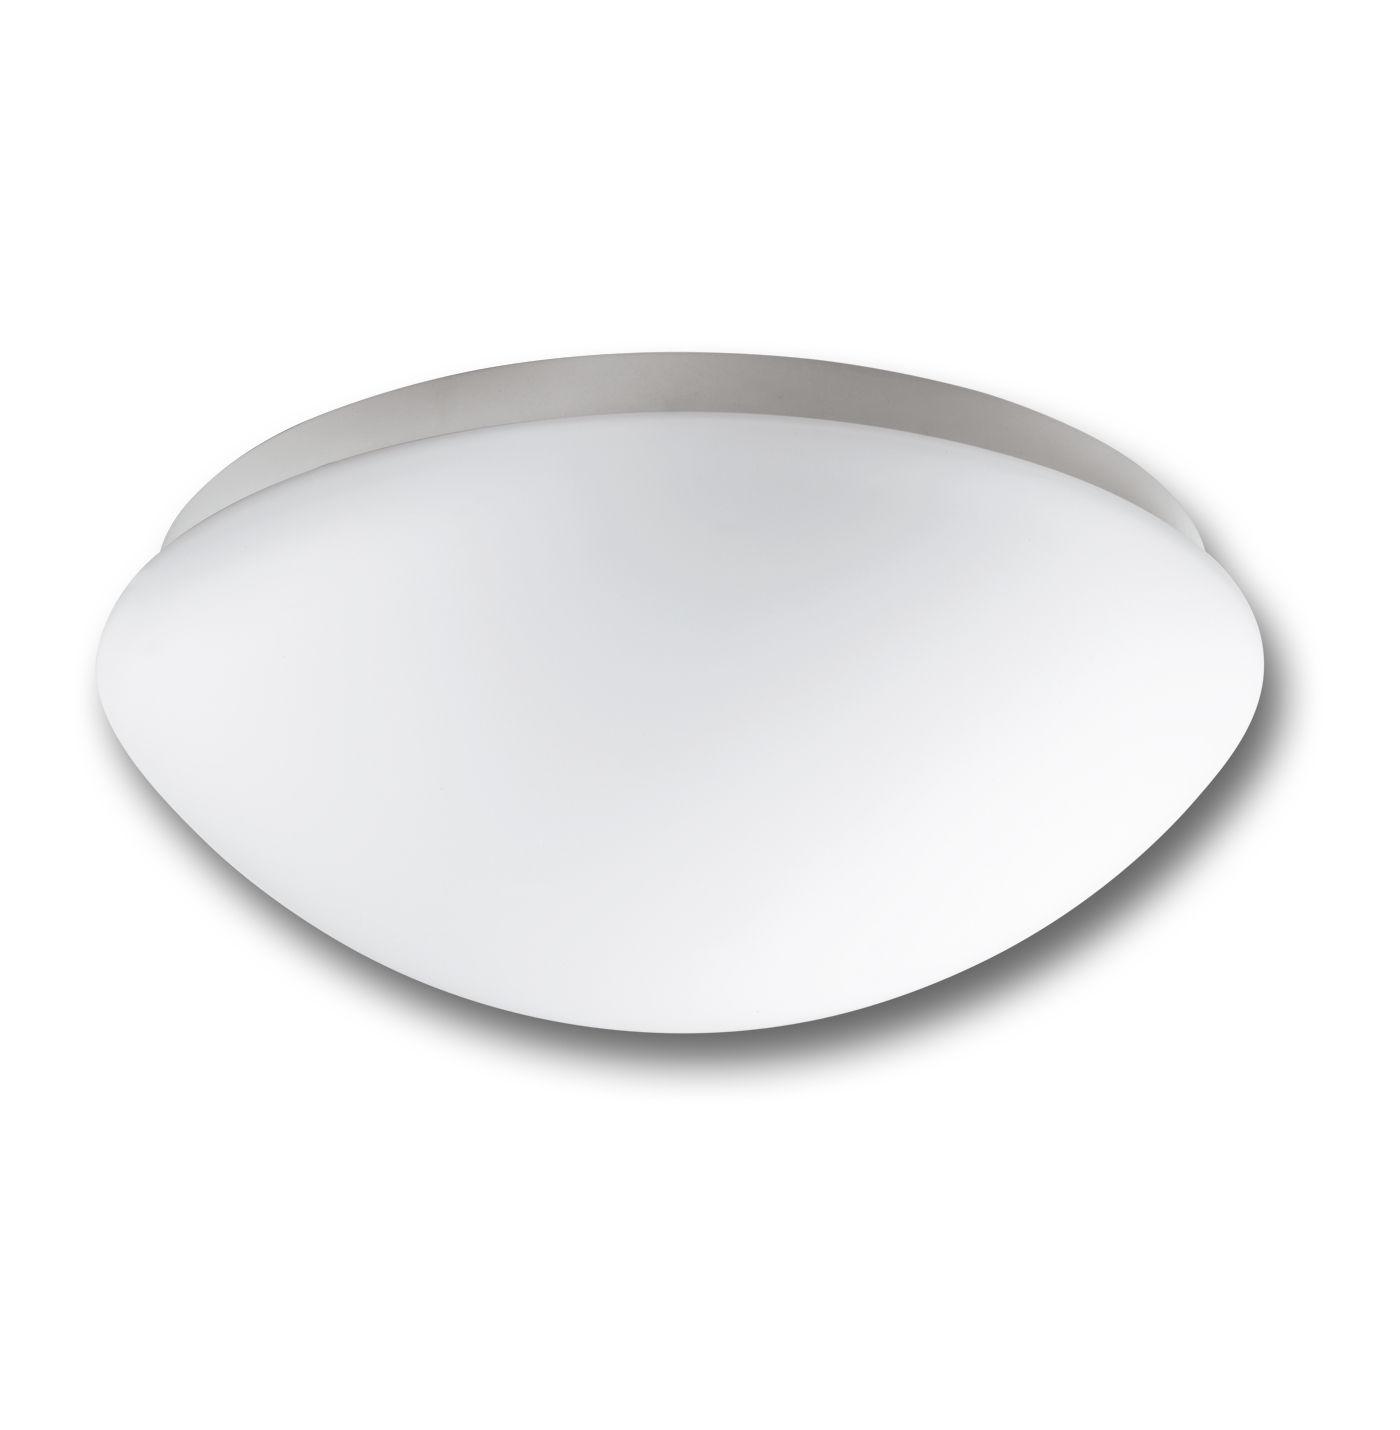 Contemporary ceiling light round glass compact fluorescent contemporary ceiling light round glass compact fluorescent rs pro 500 aloadofball Image collections